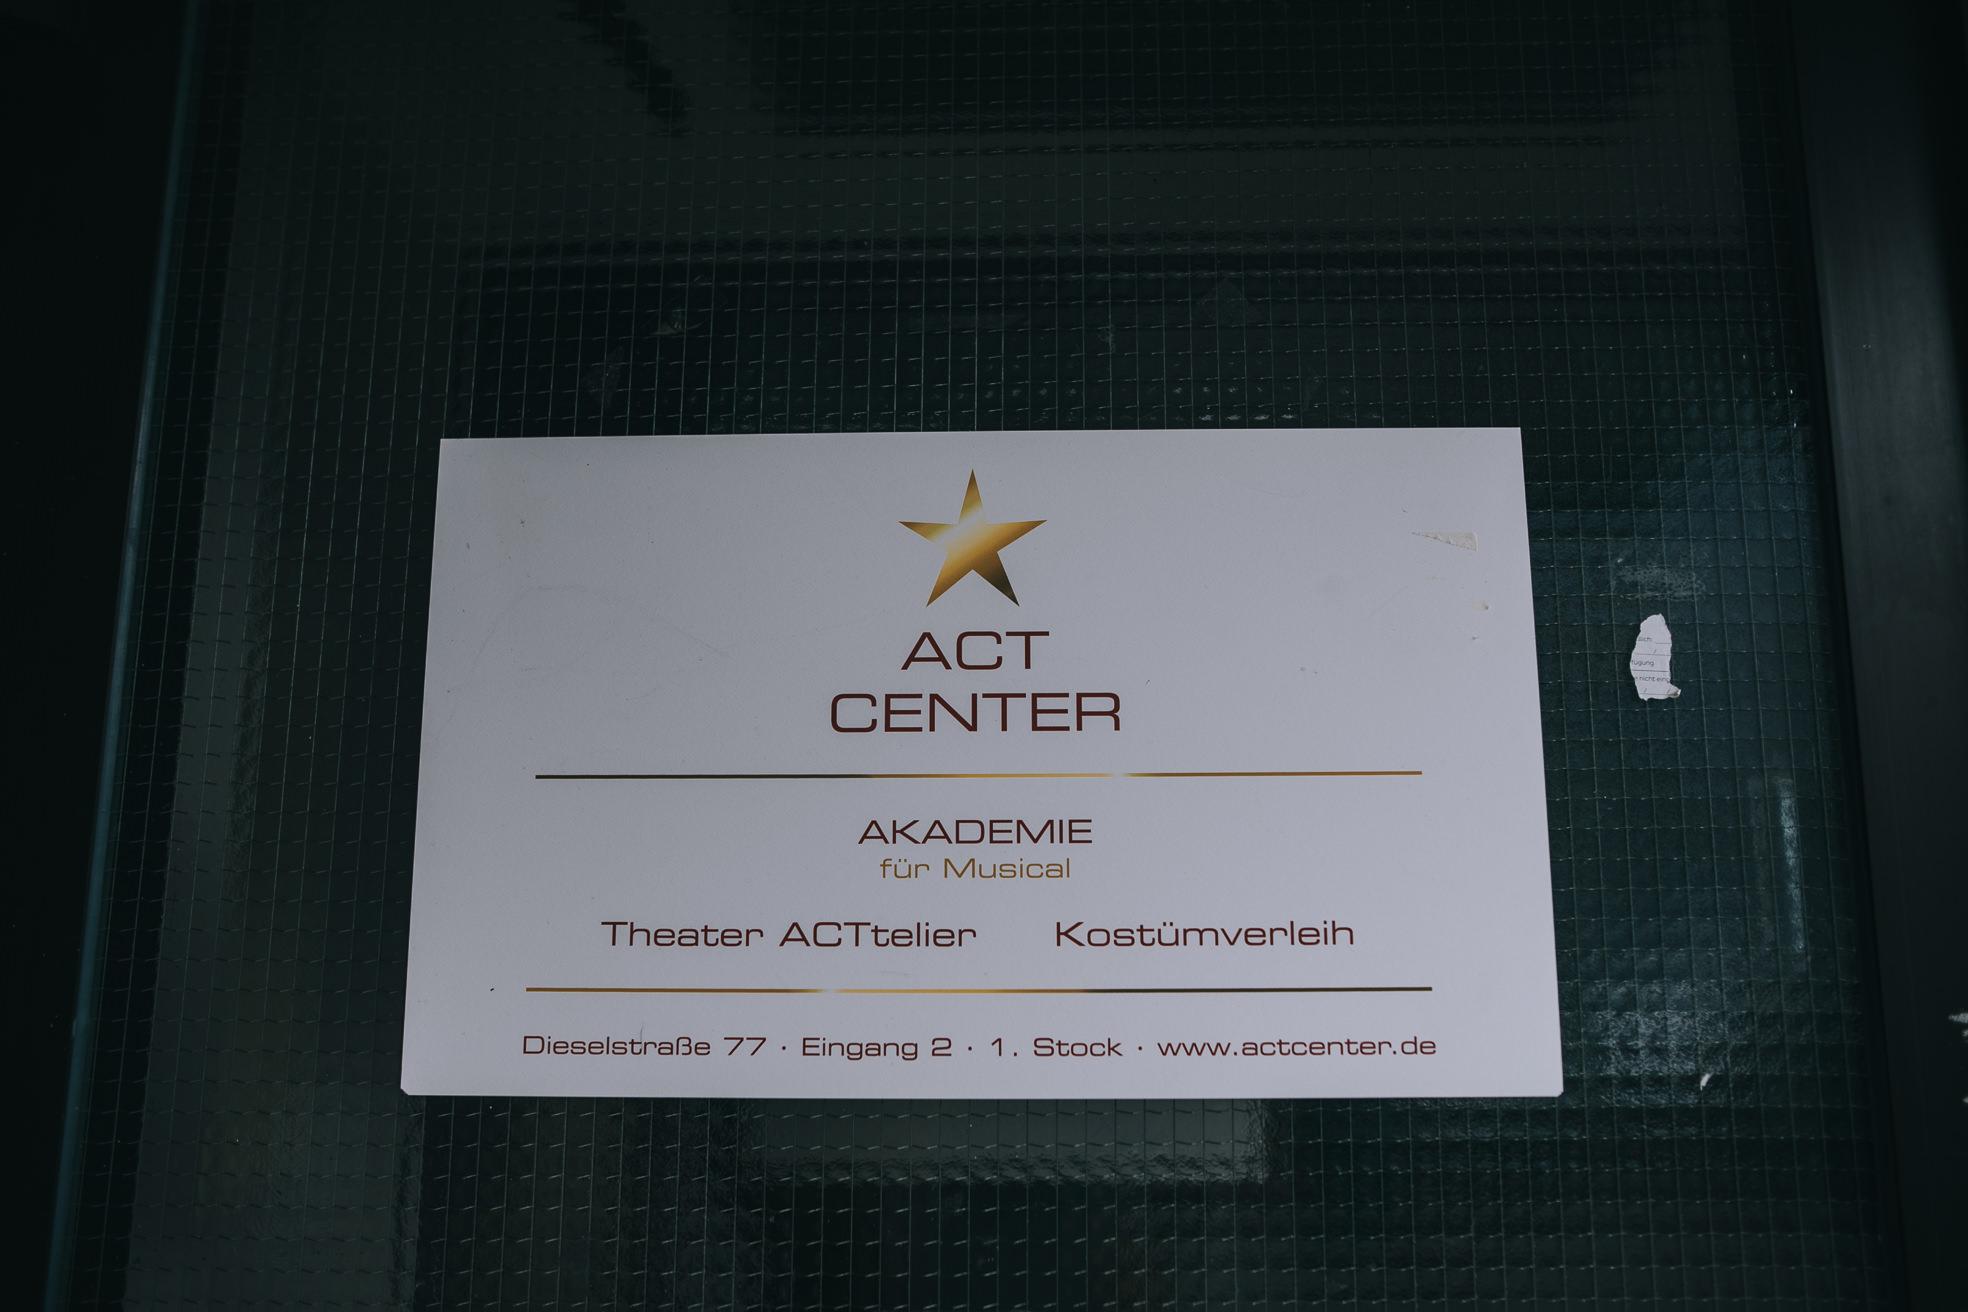 0002ACT-Theater-Nuernberg-Kostuemverleih-IM3C9470